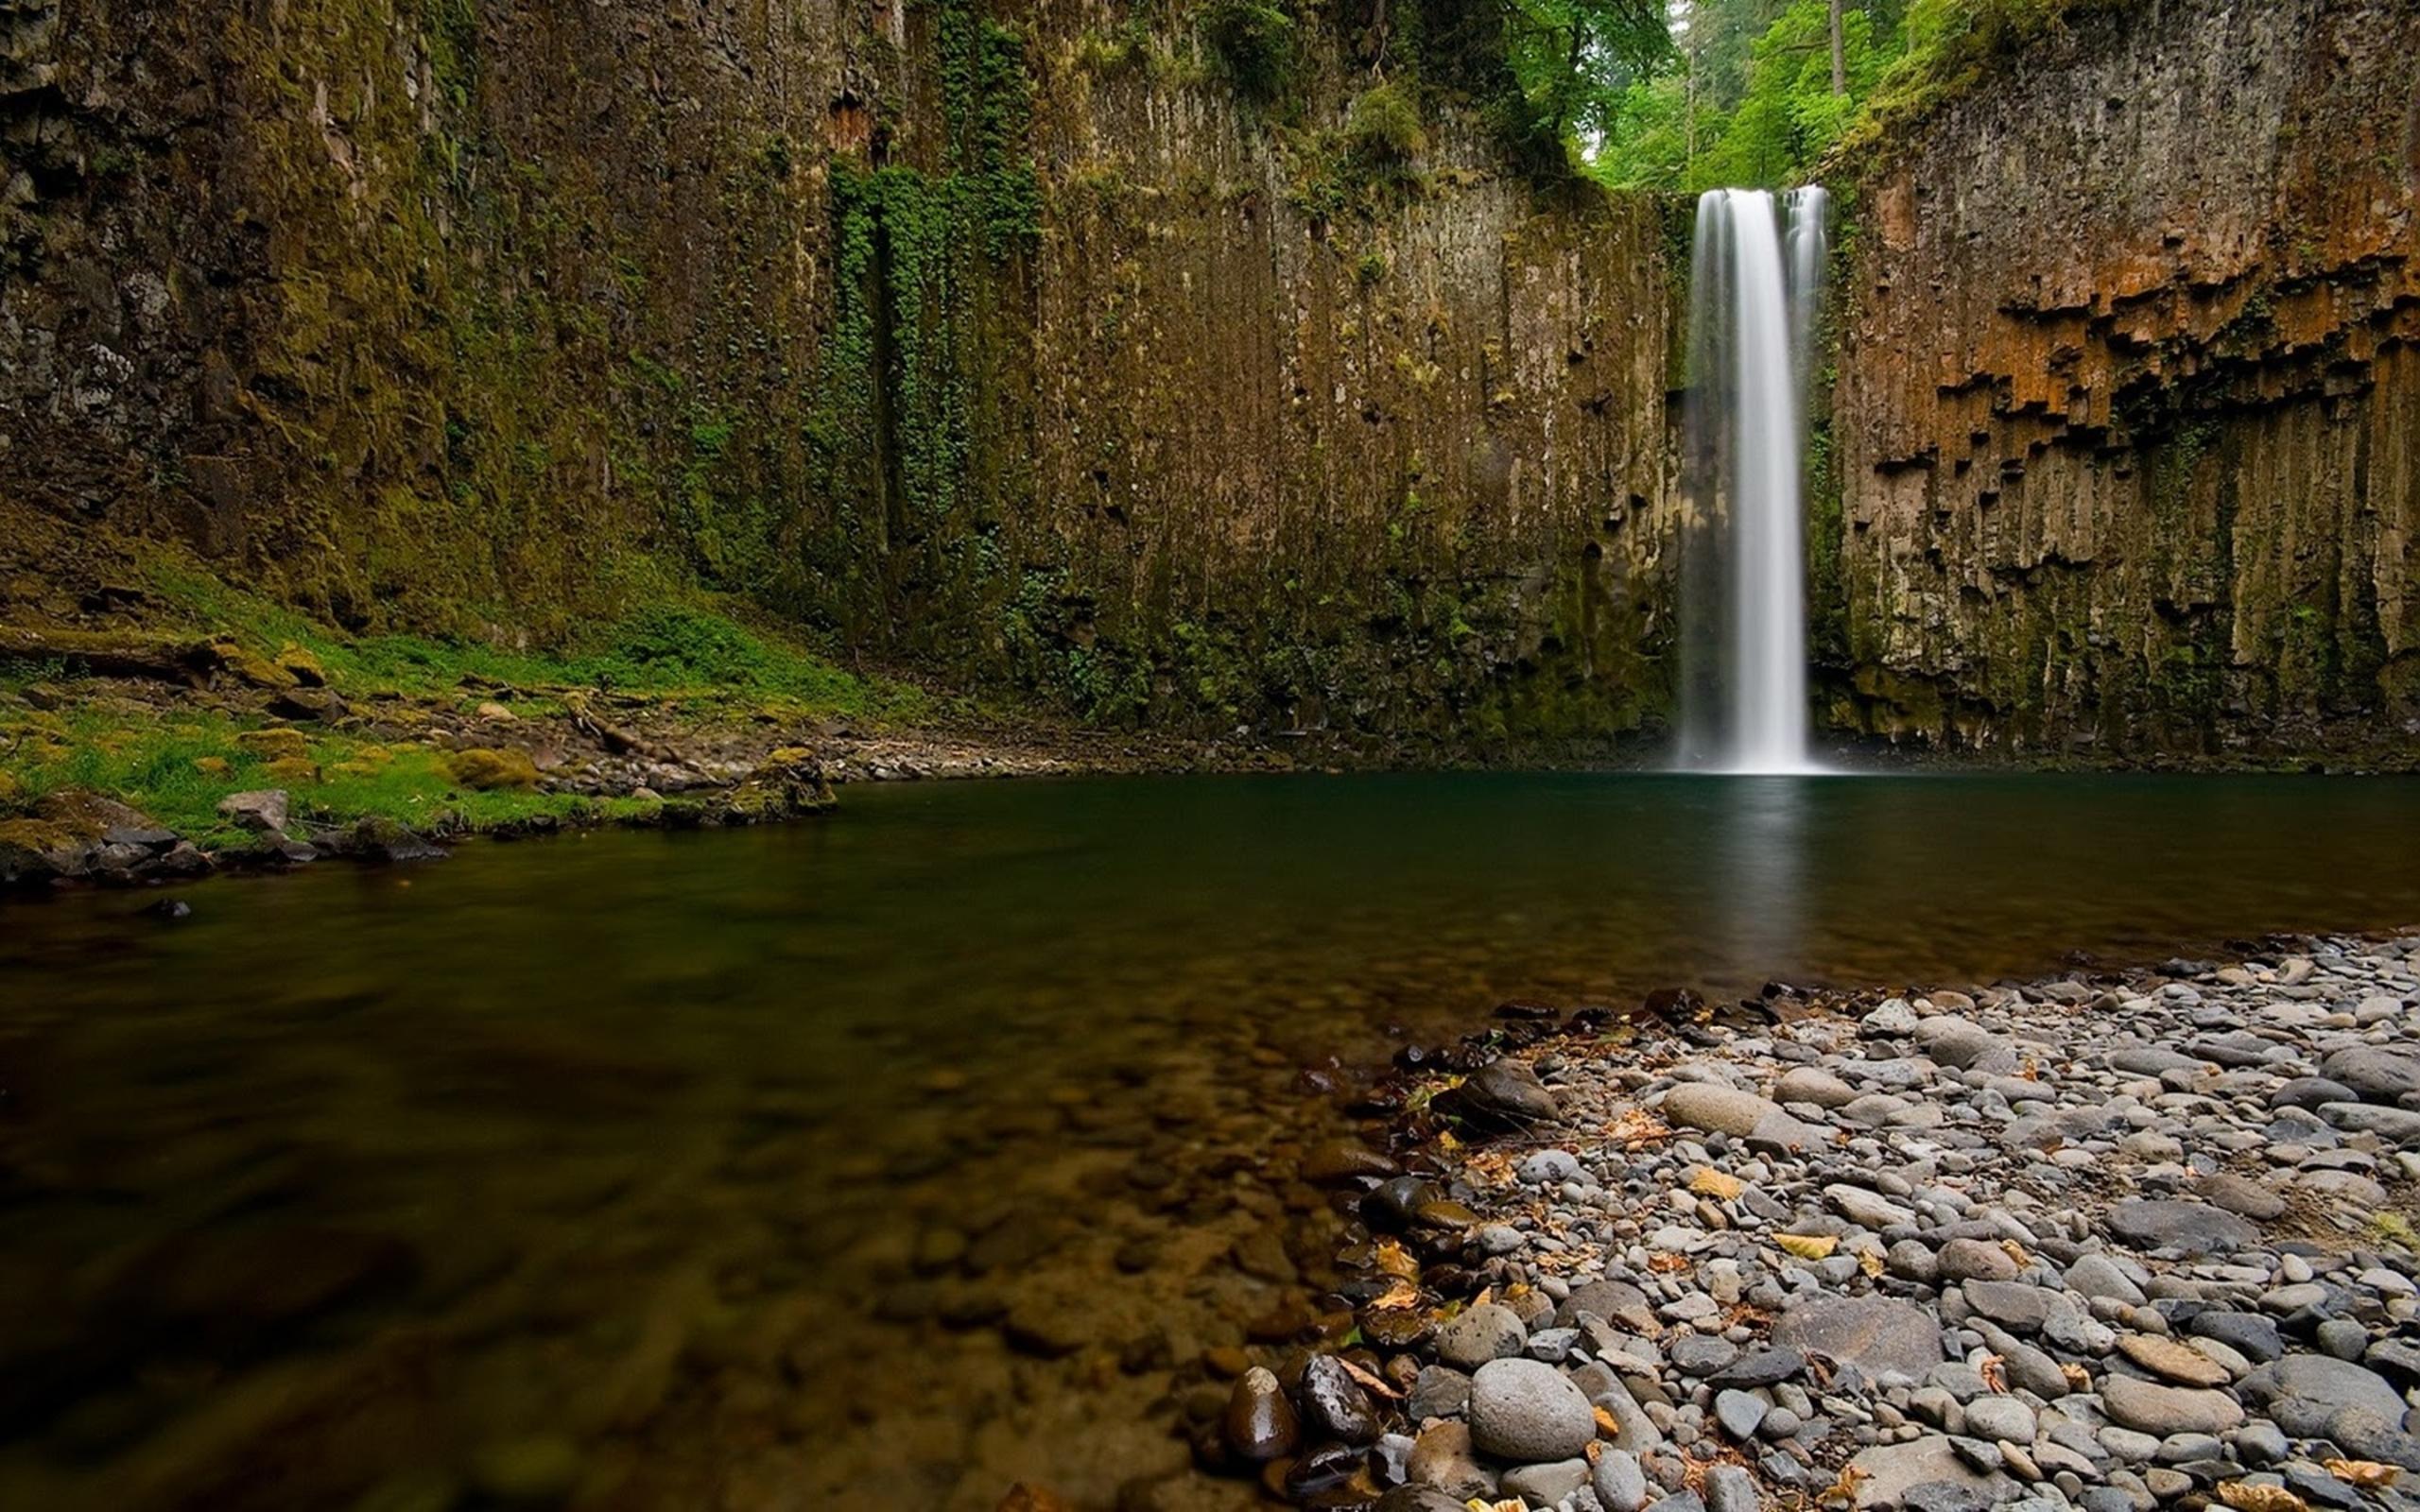 Iphone 5 Wallpaper Hd Star Wars Stones River Waterfall Nature Wallpaper Hd